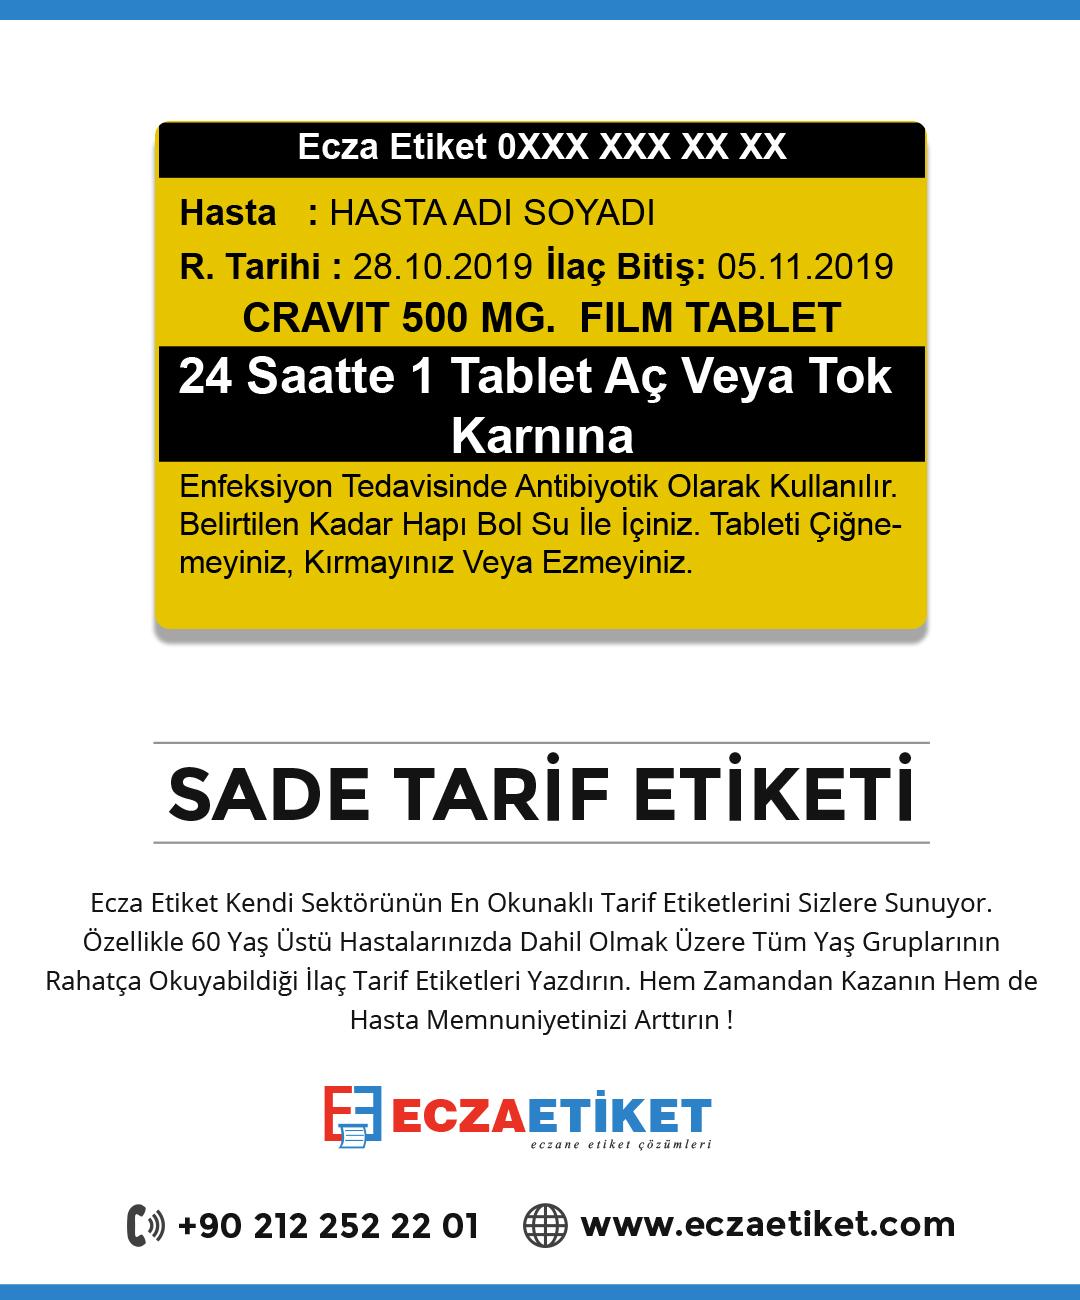 SADE-TARİF-ETİKET.jpg